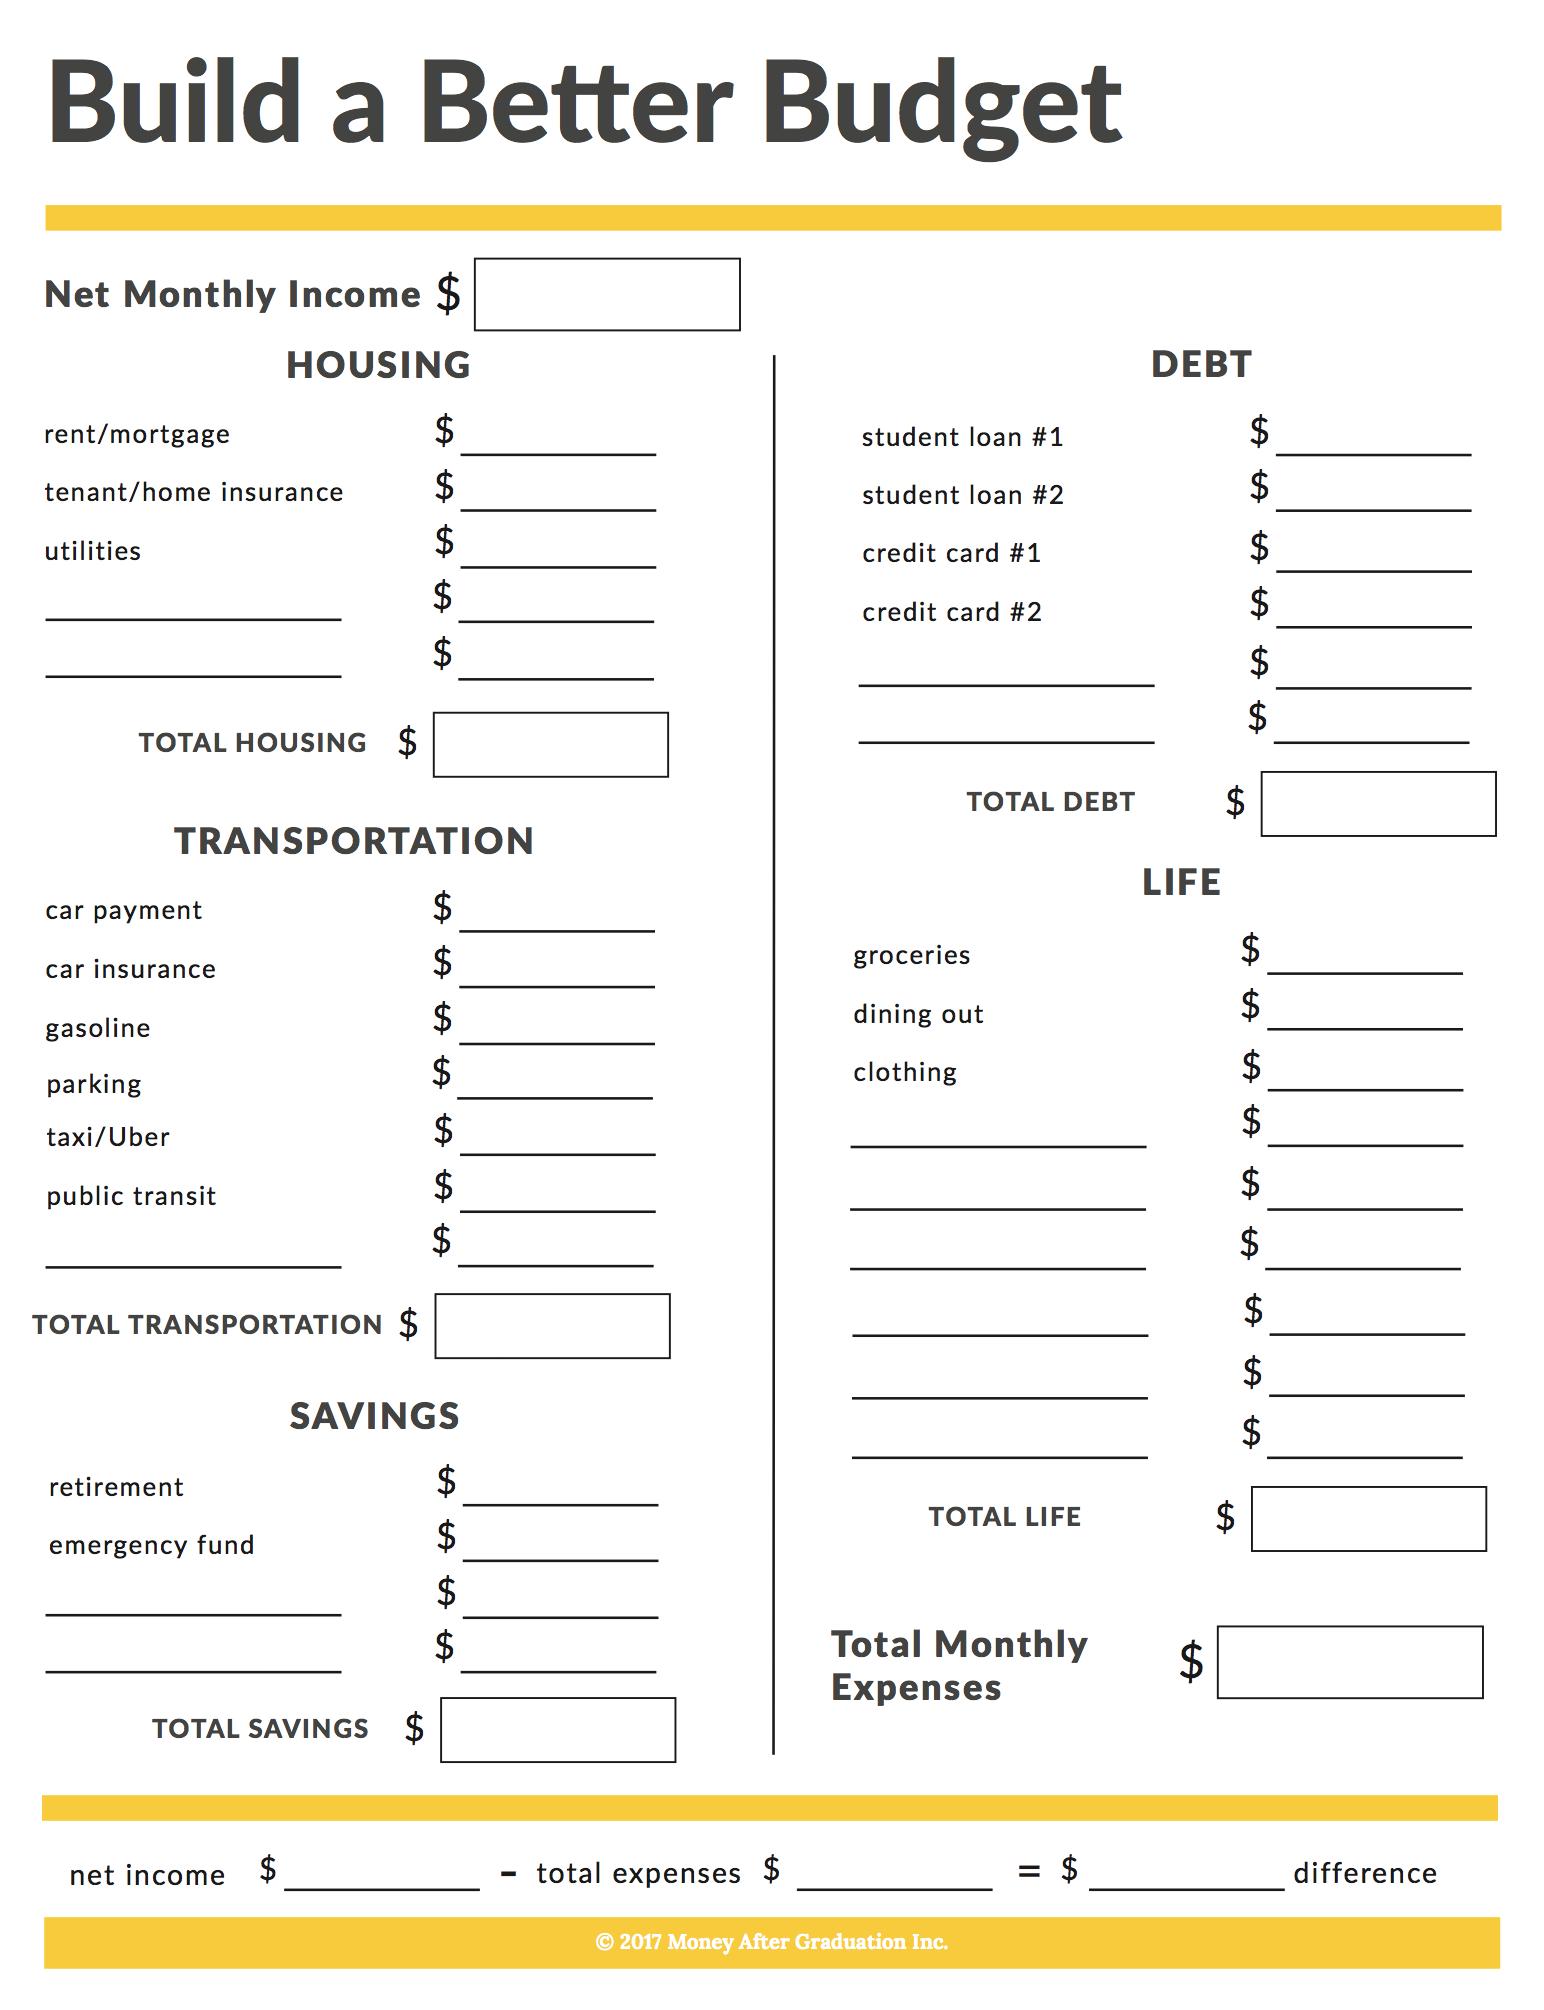 Free Budget Workbook • Money After Graduation